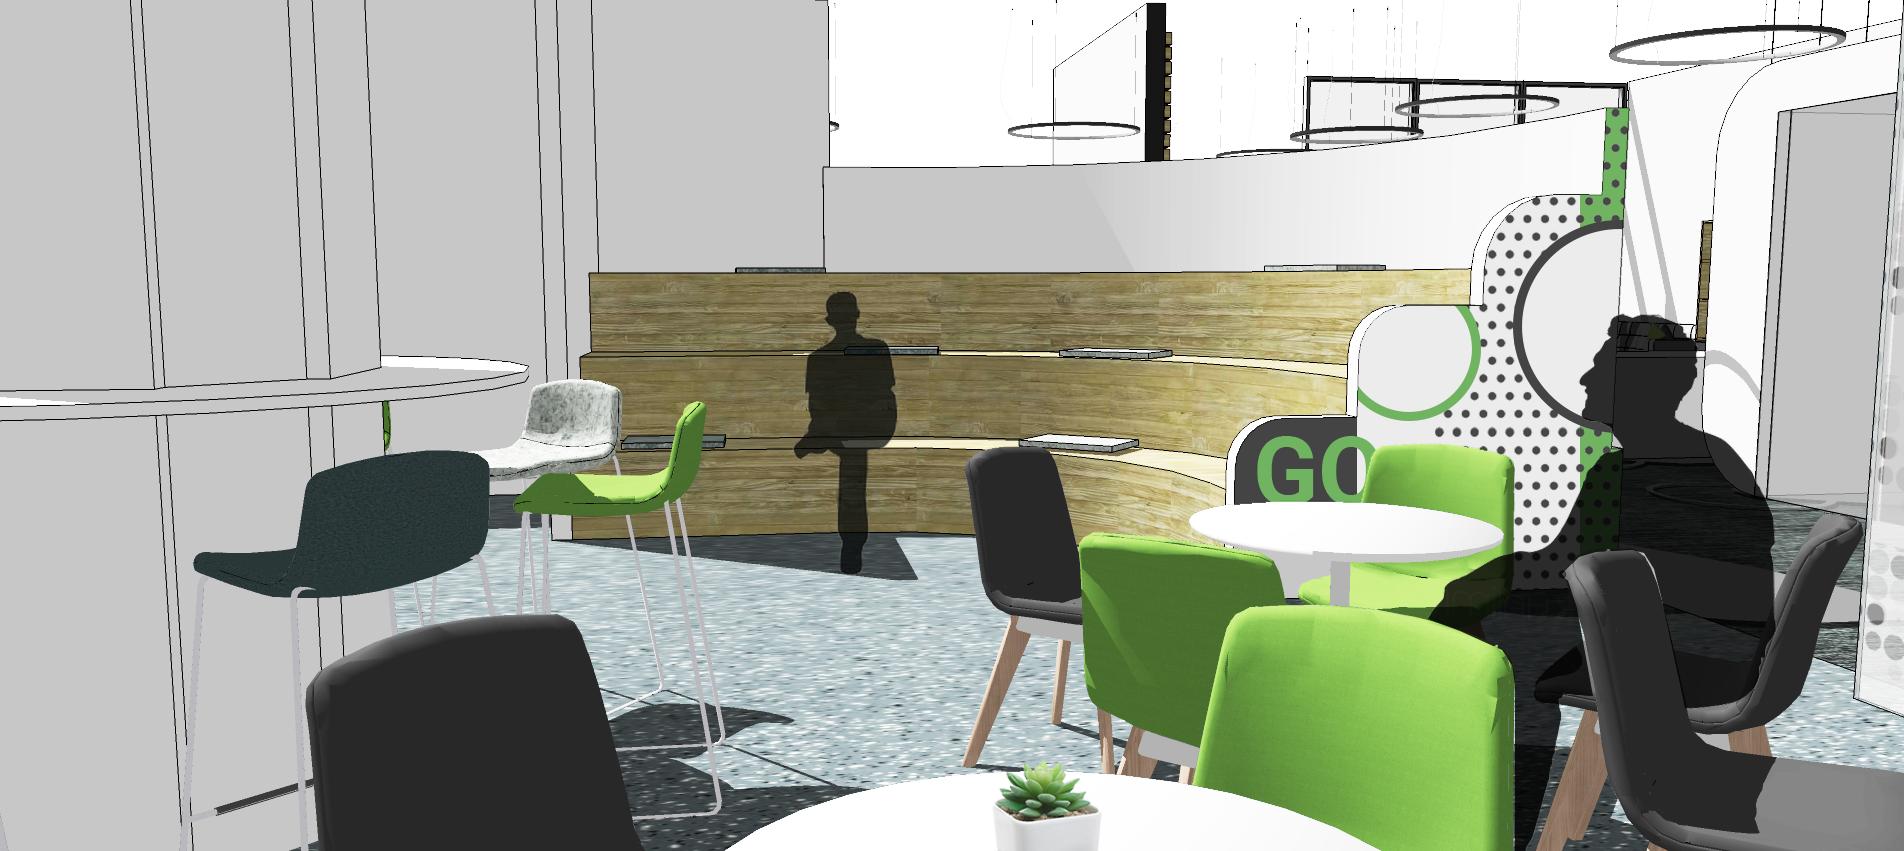 McKellar commercial interior design Glasgow.png